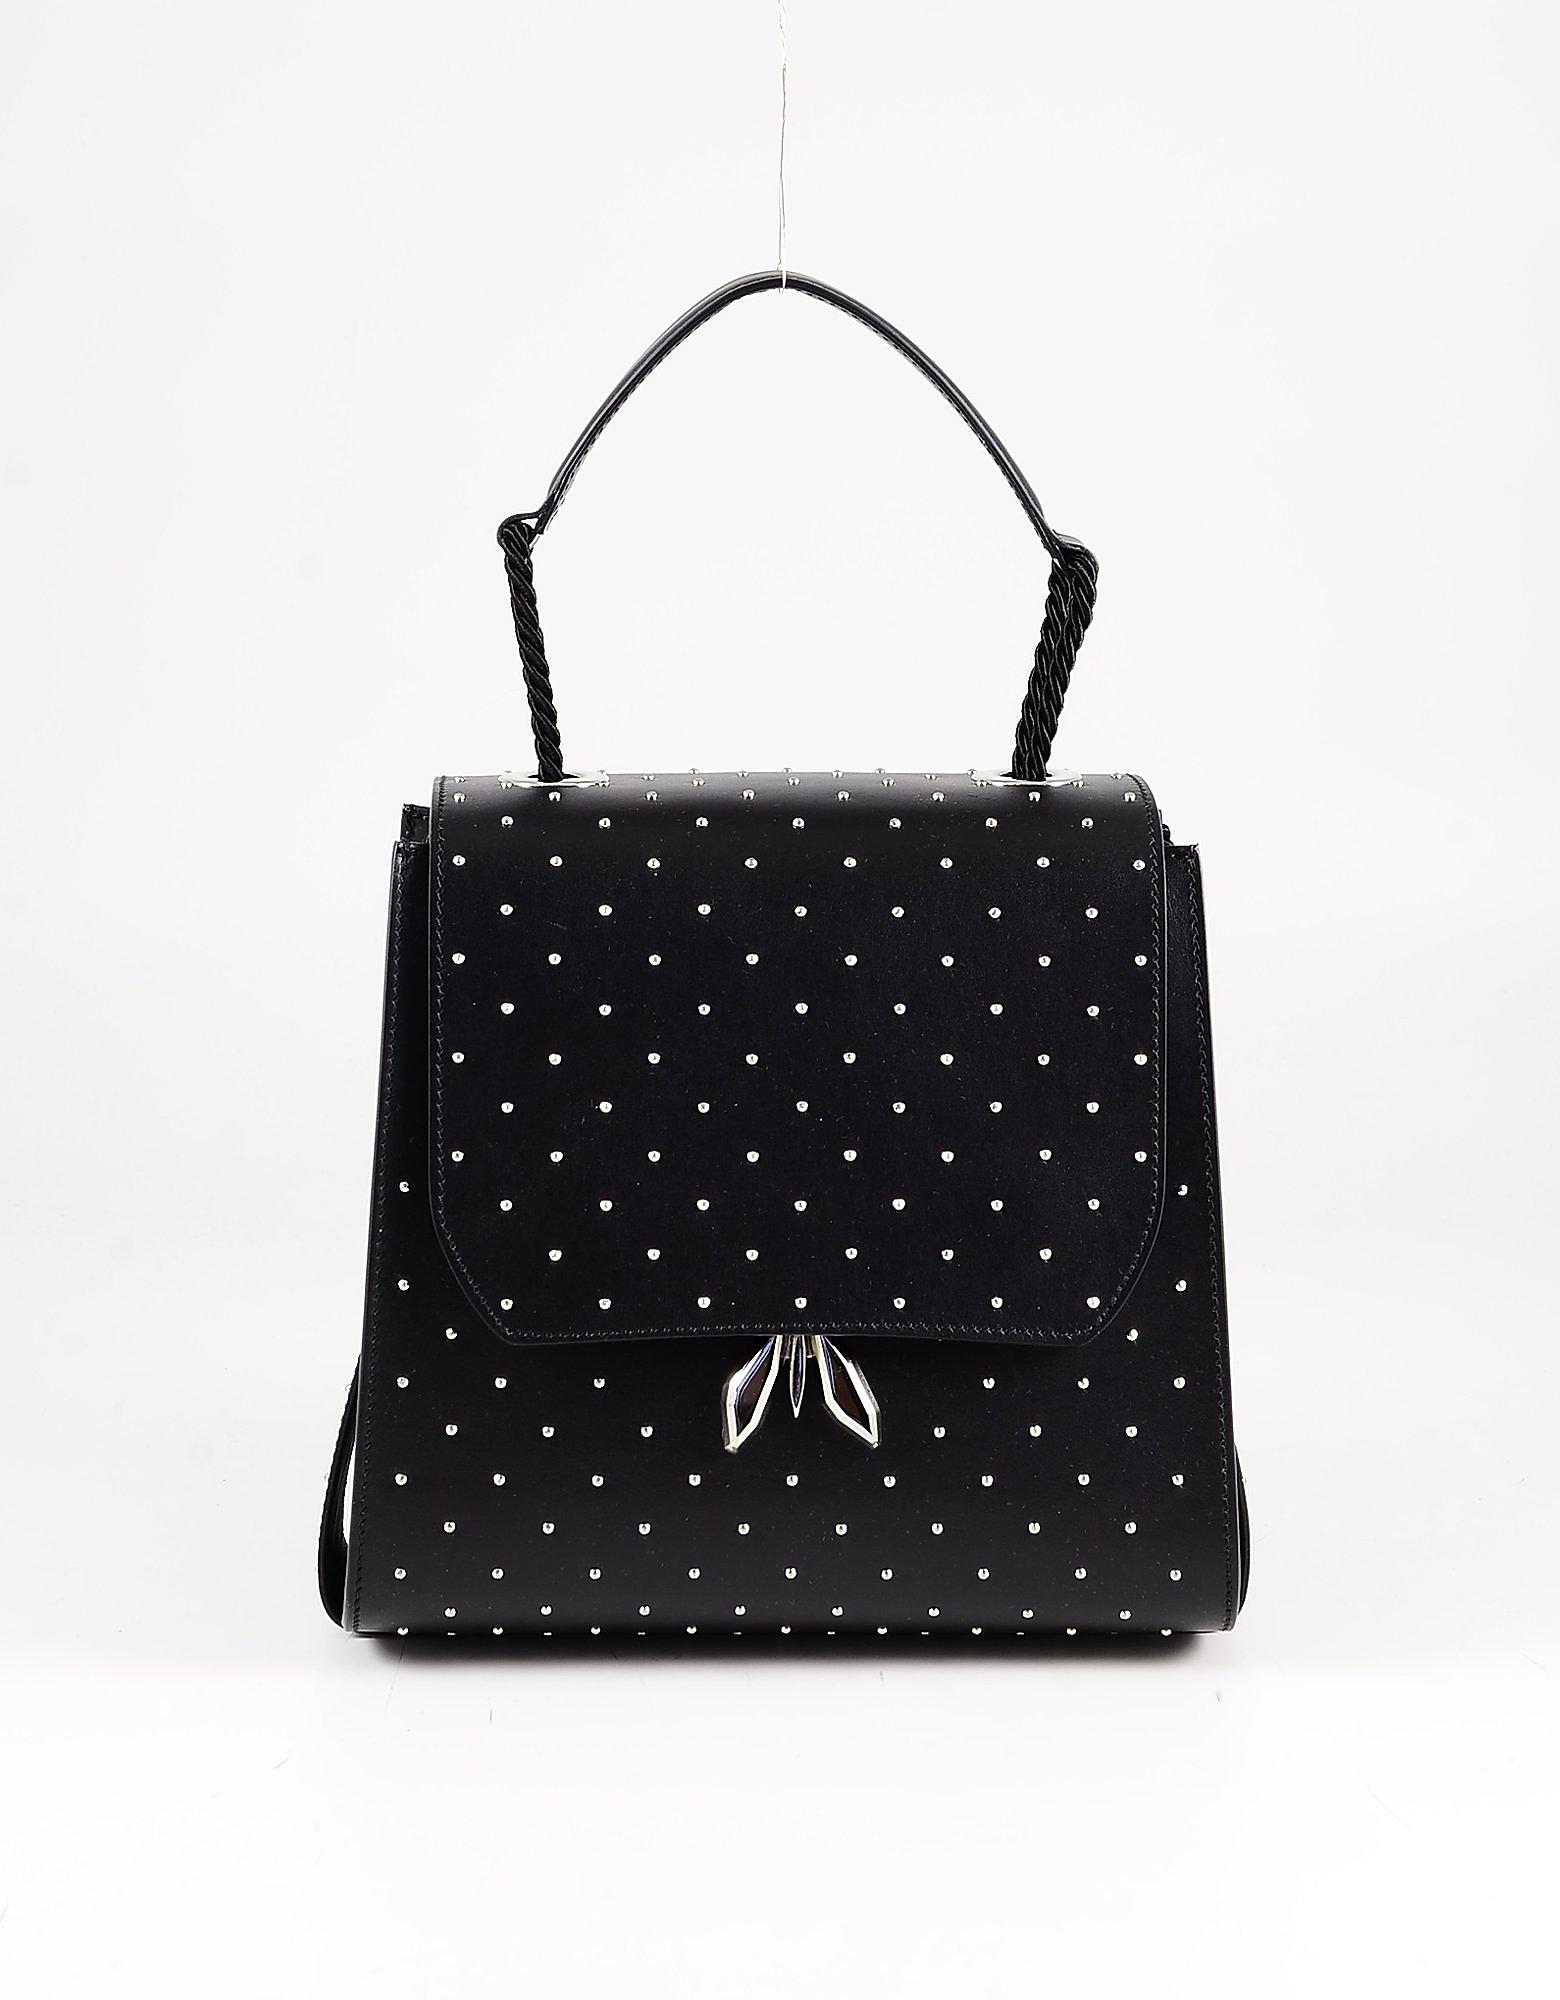 Patrizia Pepe Black Studded Leather Top-handle Bag